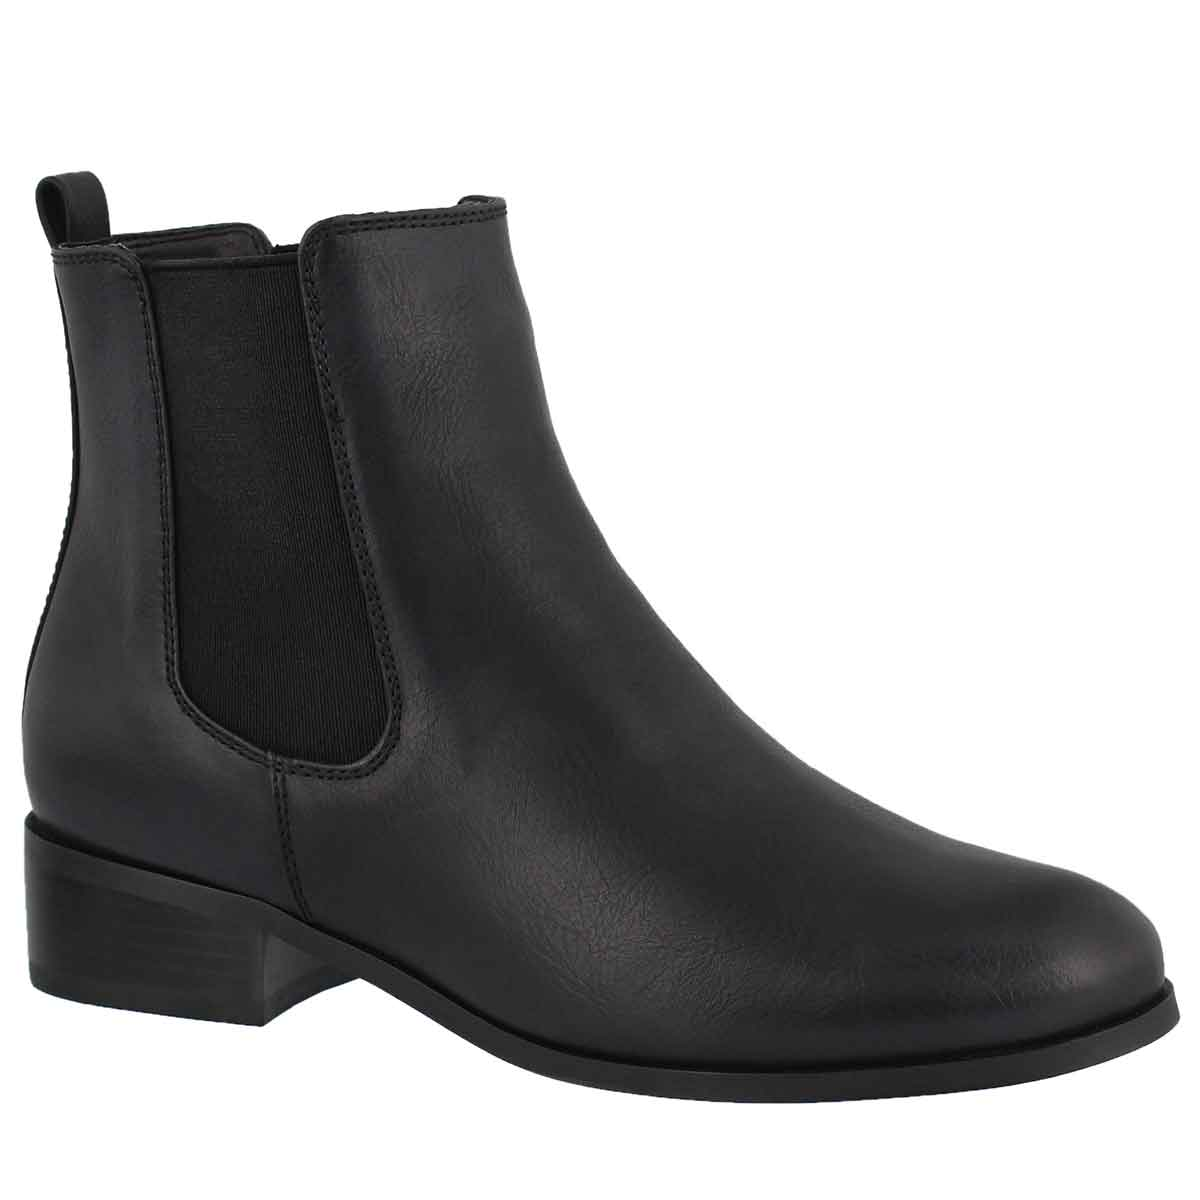 Women's BERDINA black chelsea boots